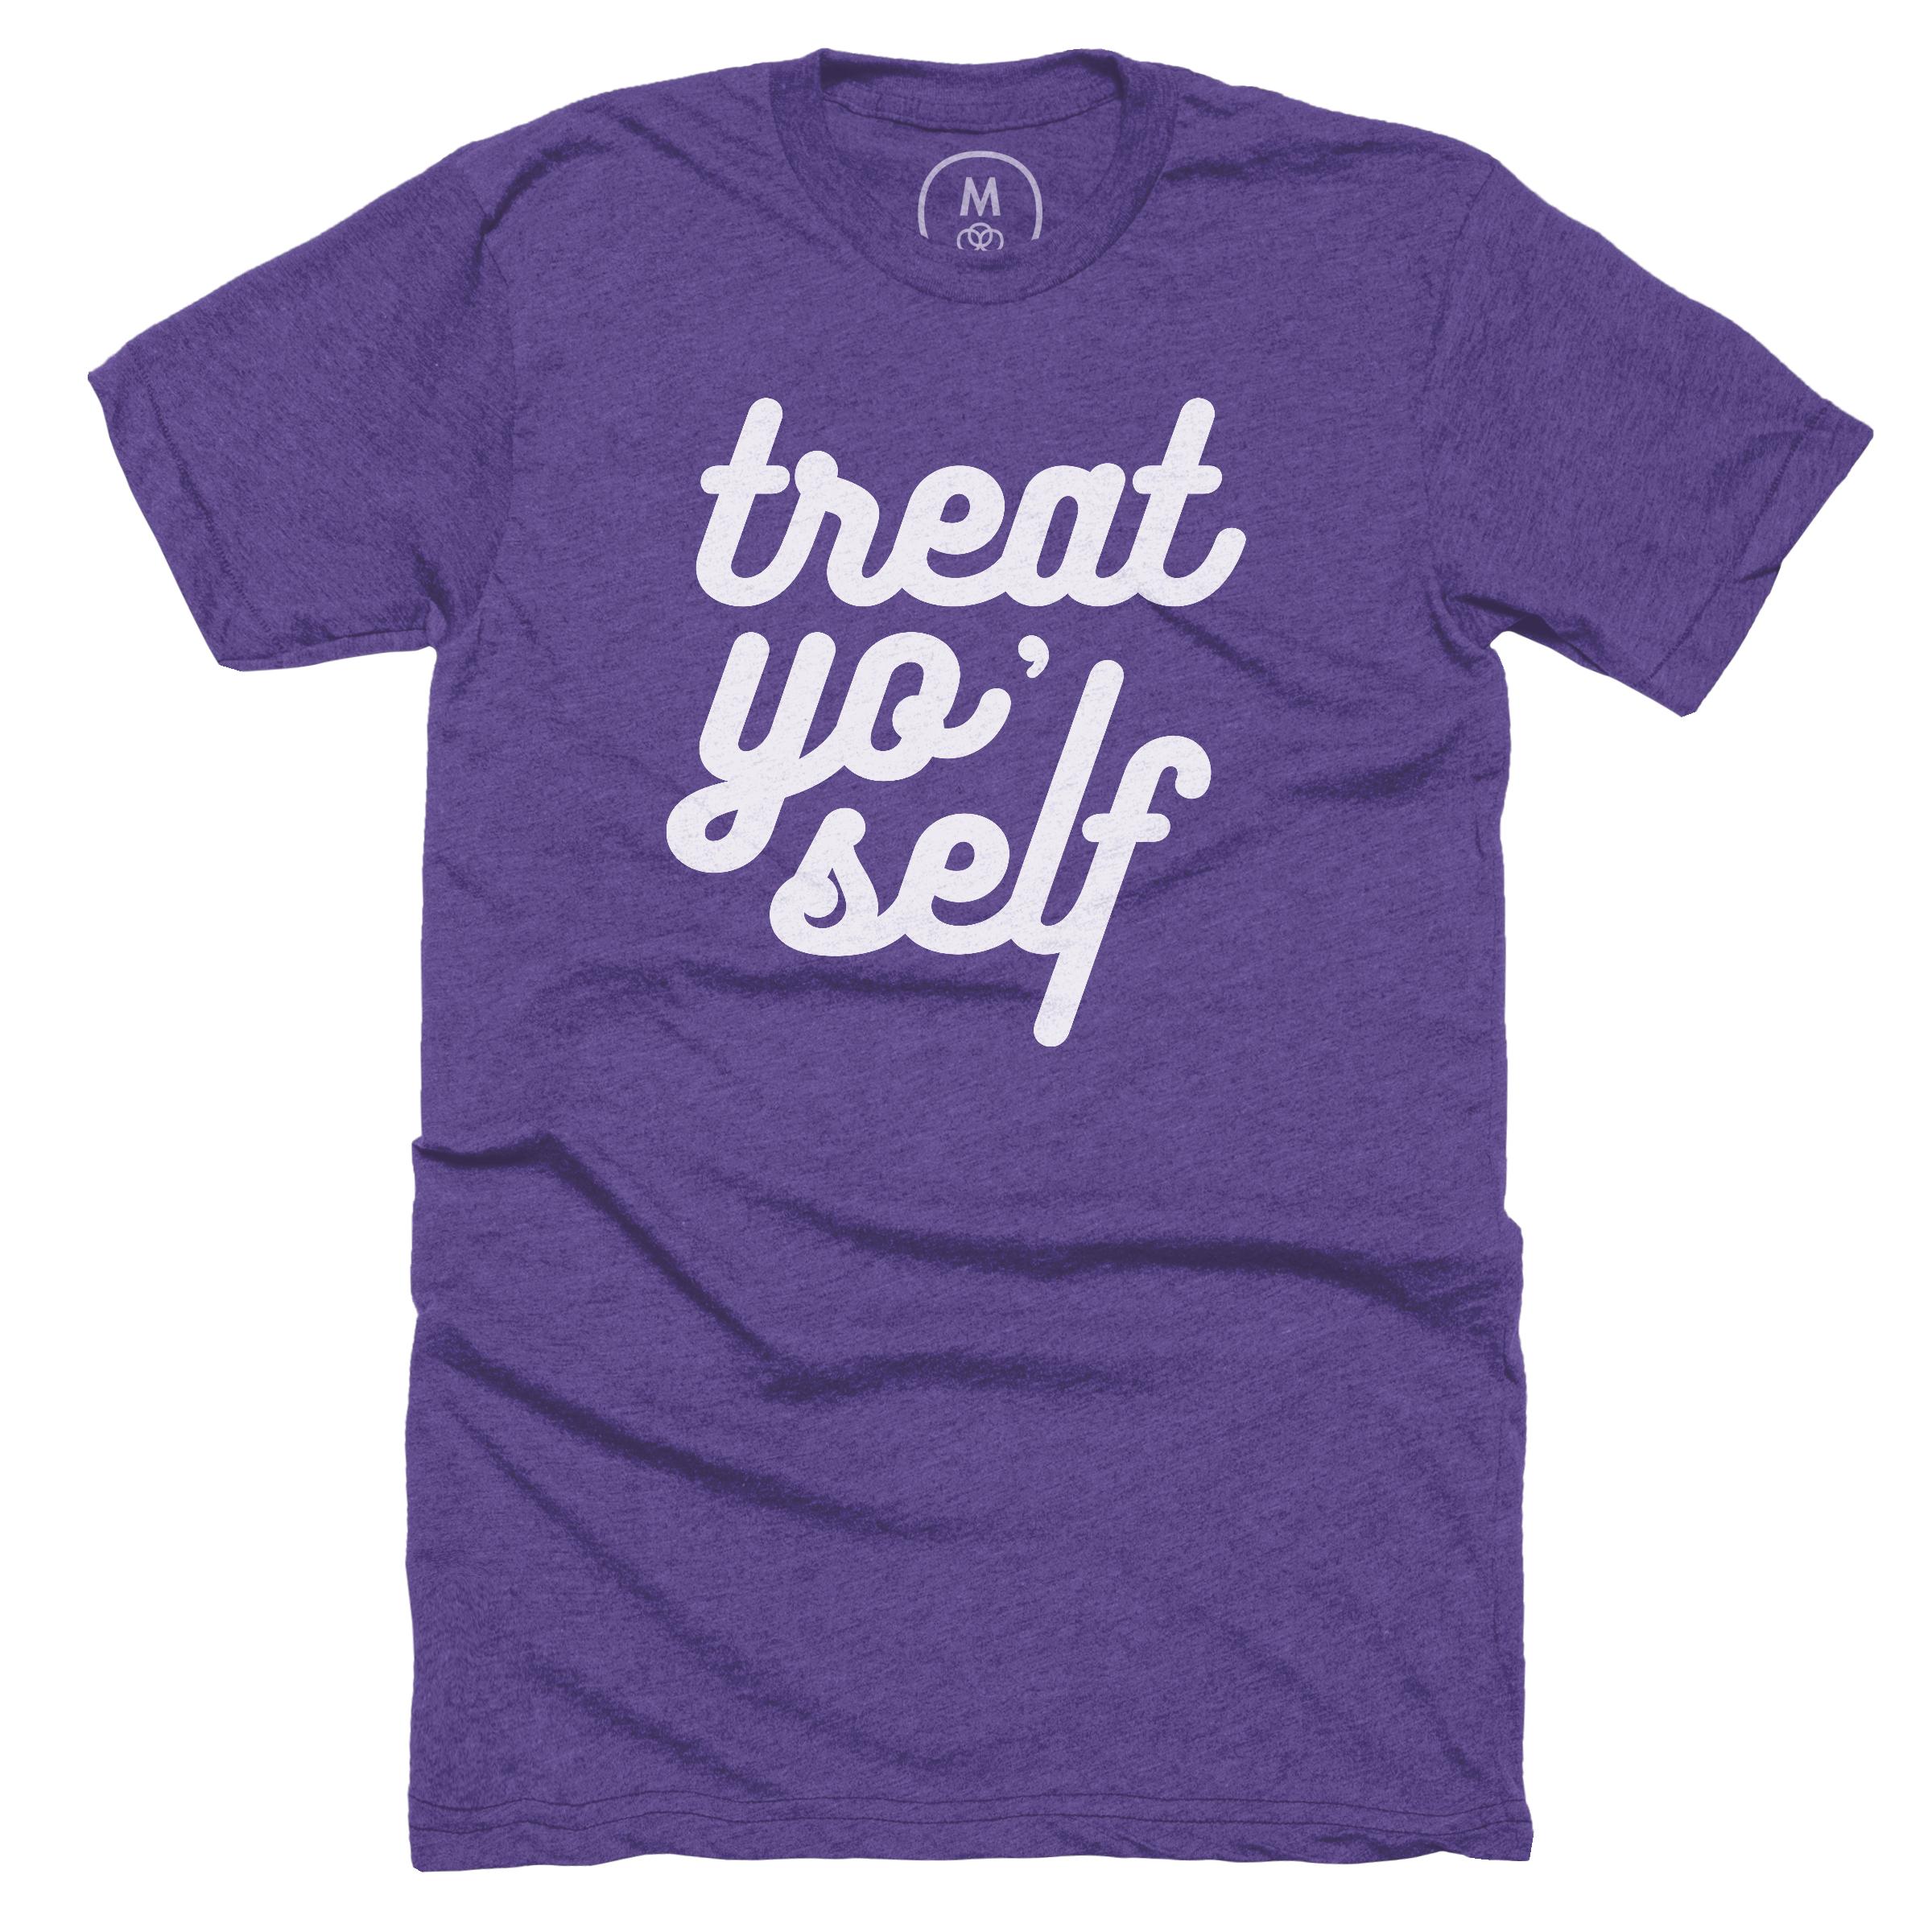 Treat Yo' Self Purple Rush (Men's)